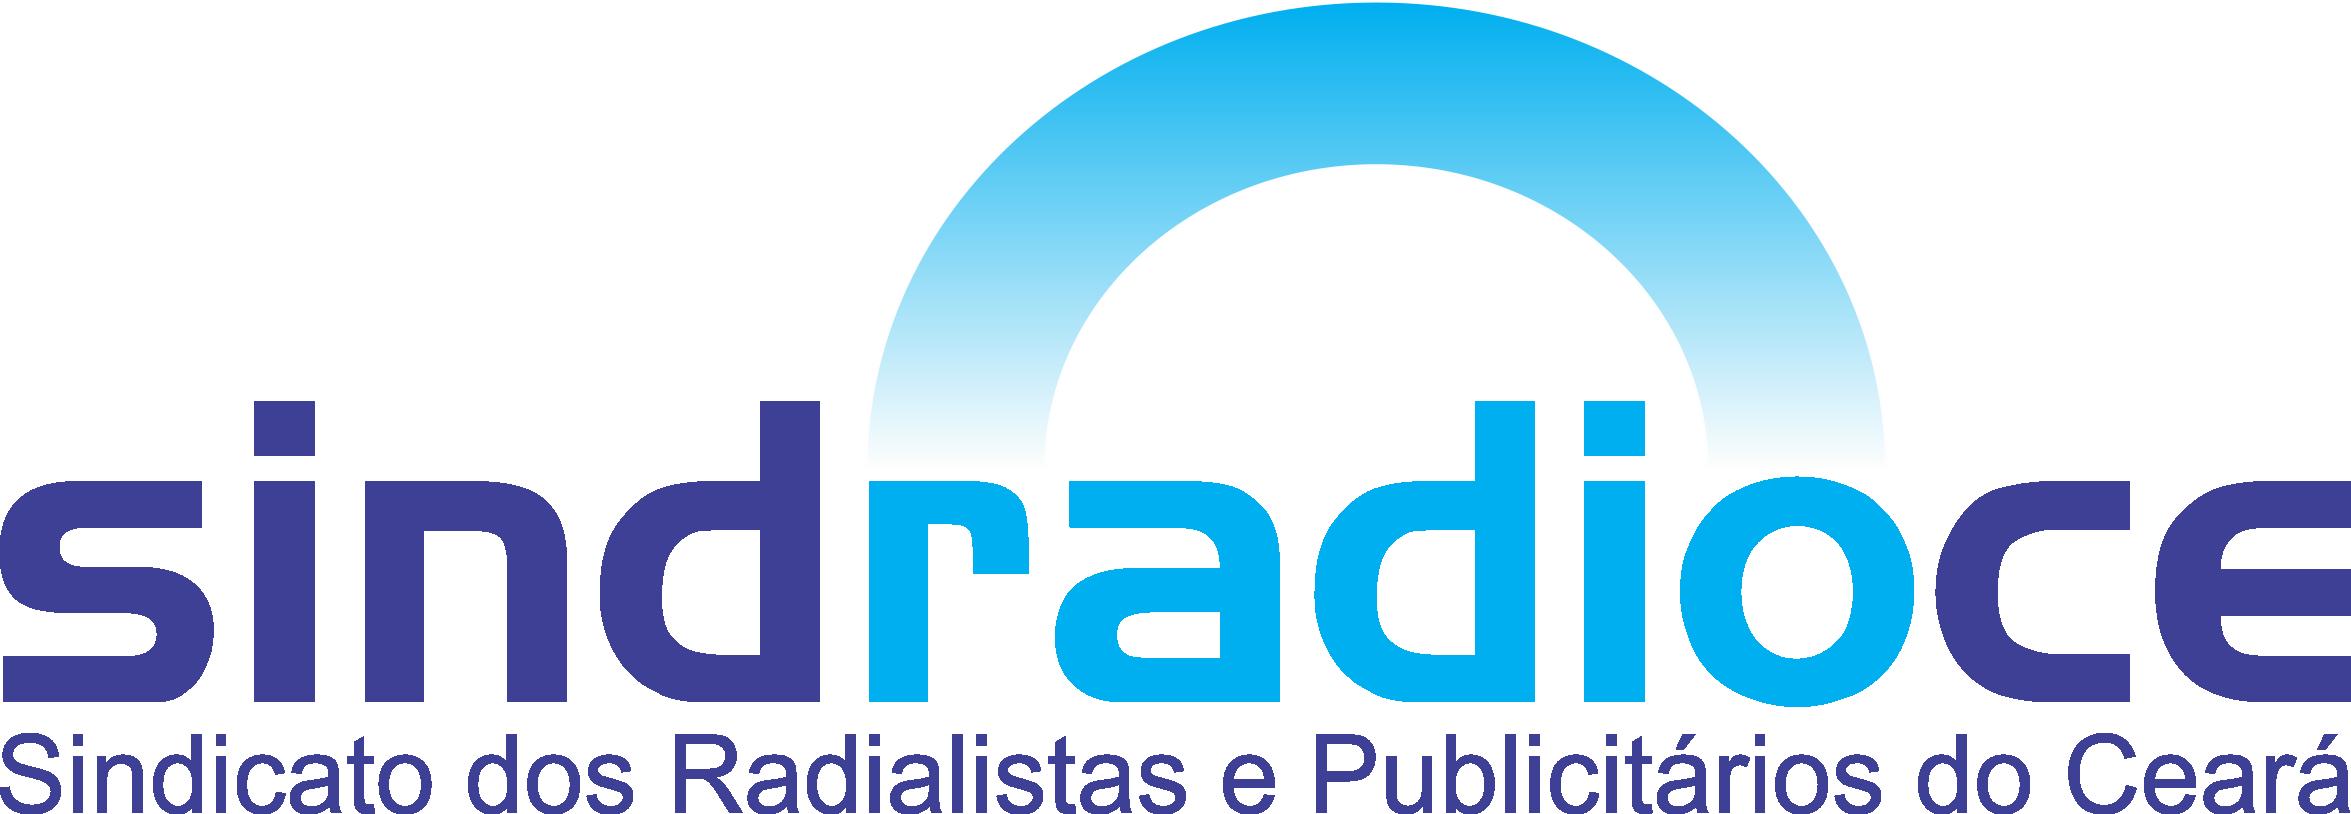 SindRadioCE Logotipo